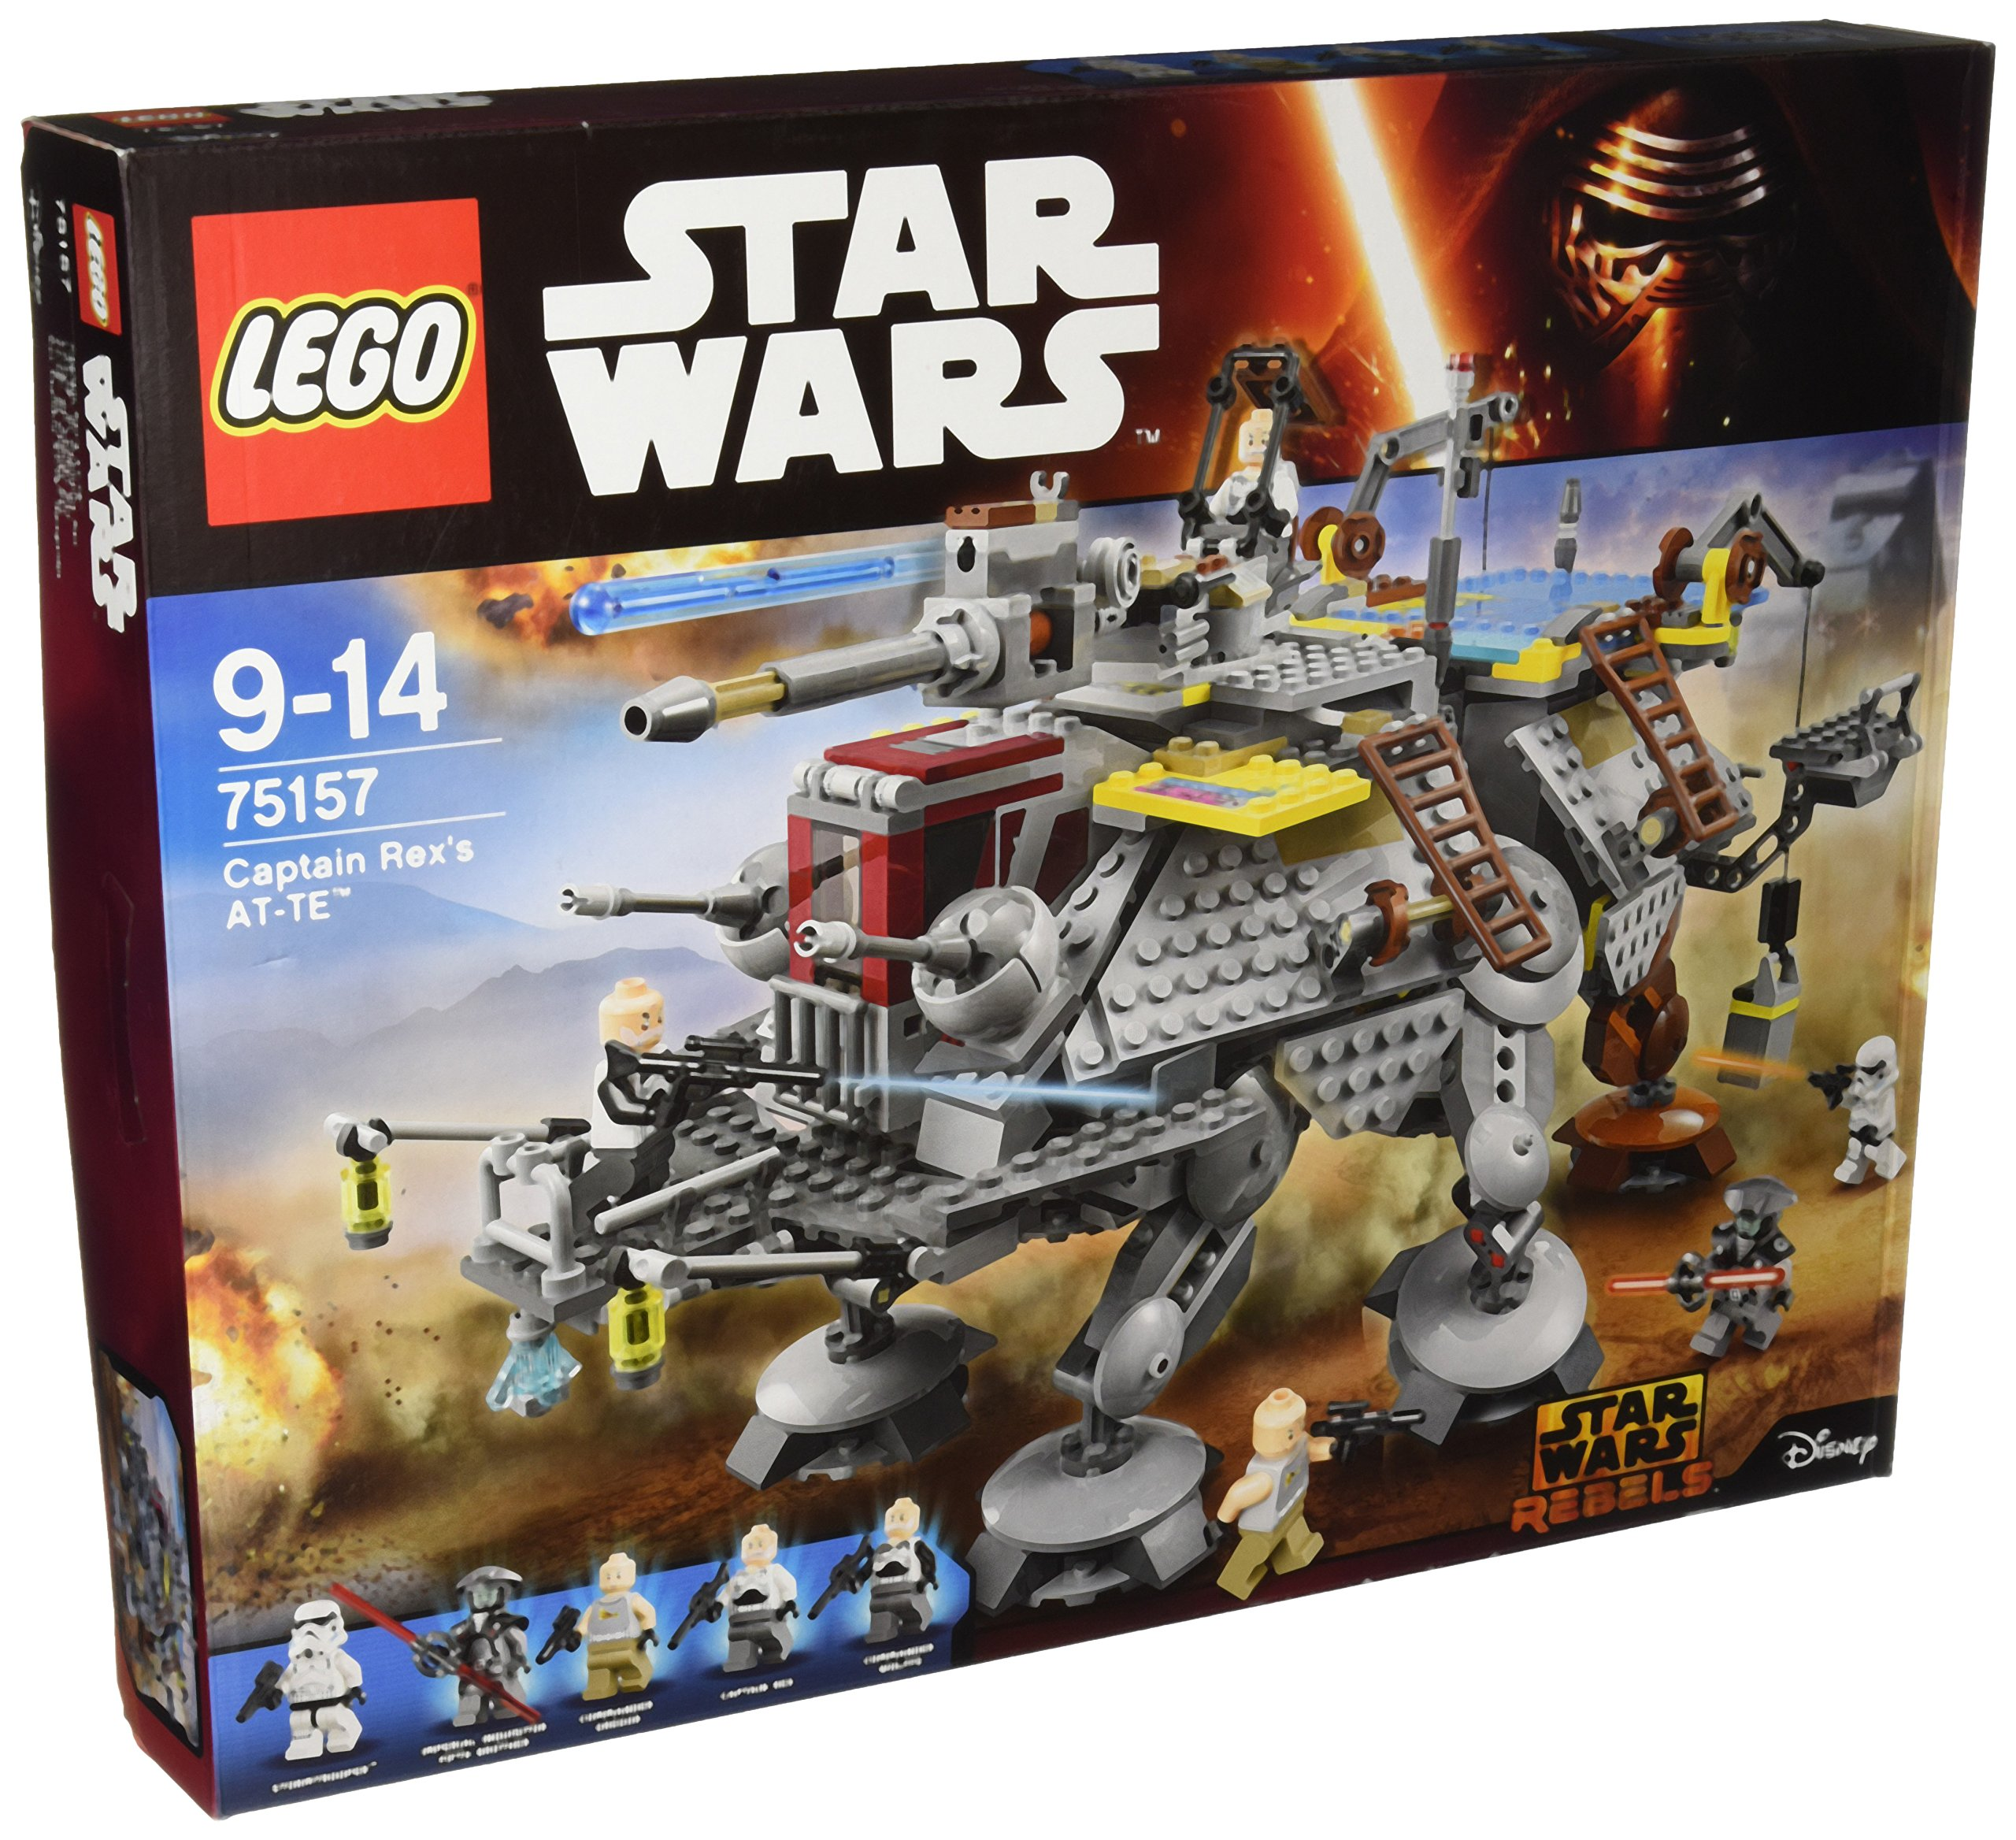 LEGO Star Wars 75157 - Captain Rex's AT-TE